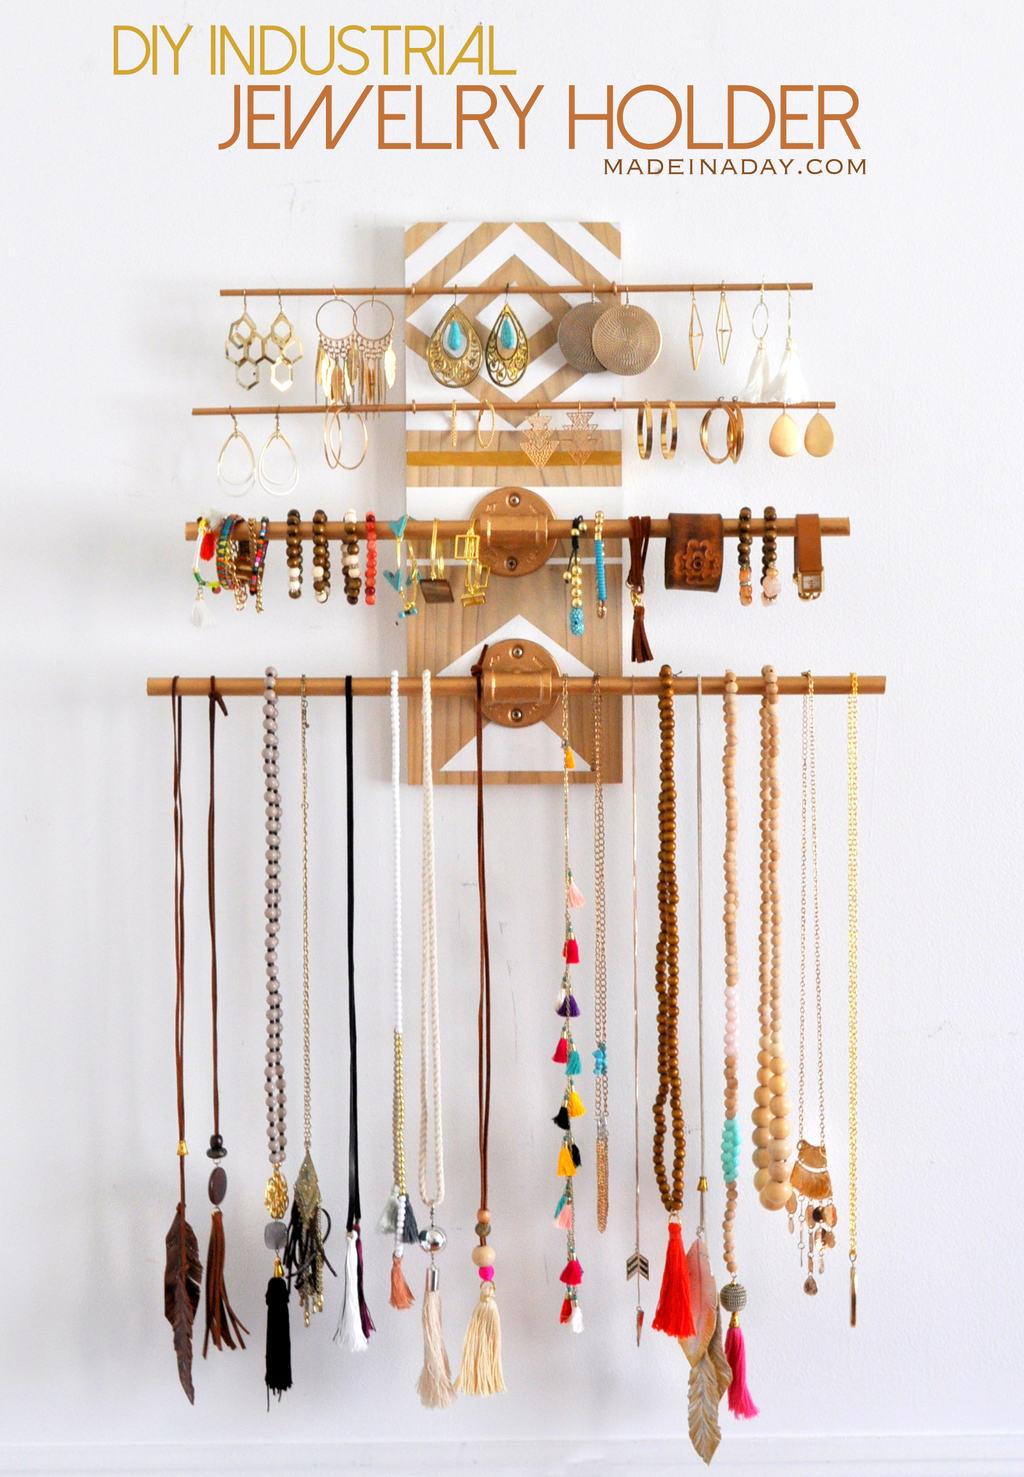 Vikalpah: 10 unique jewelry organizer ideas